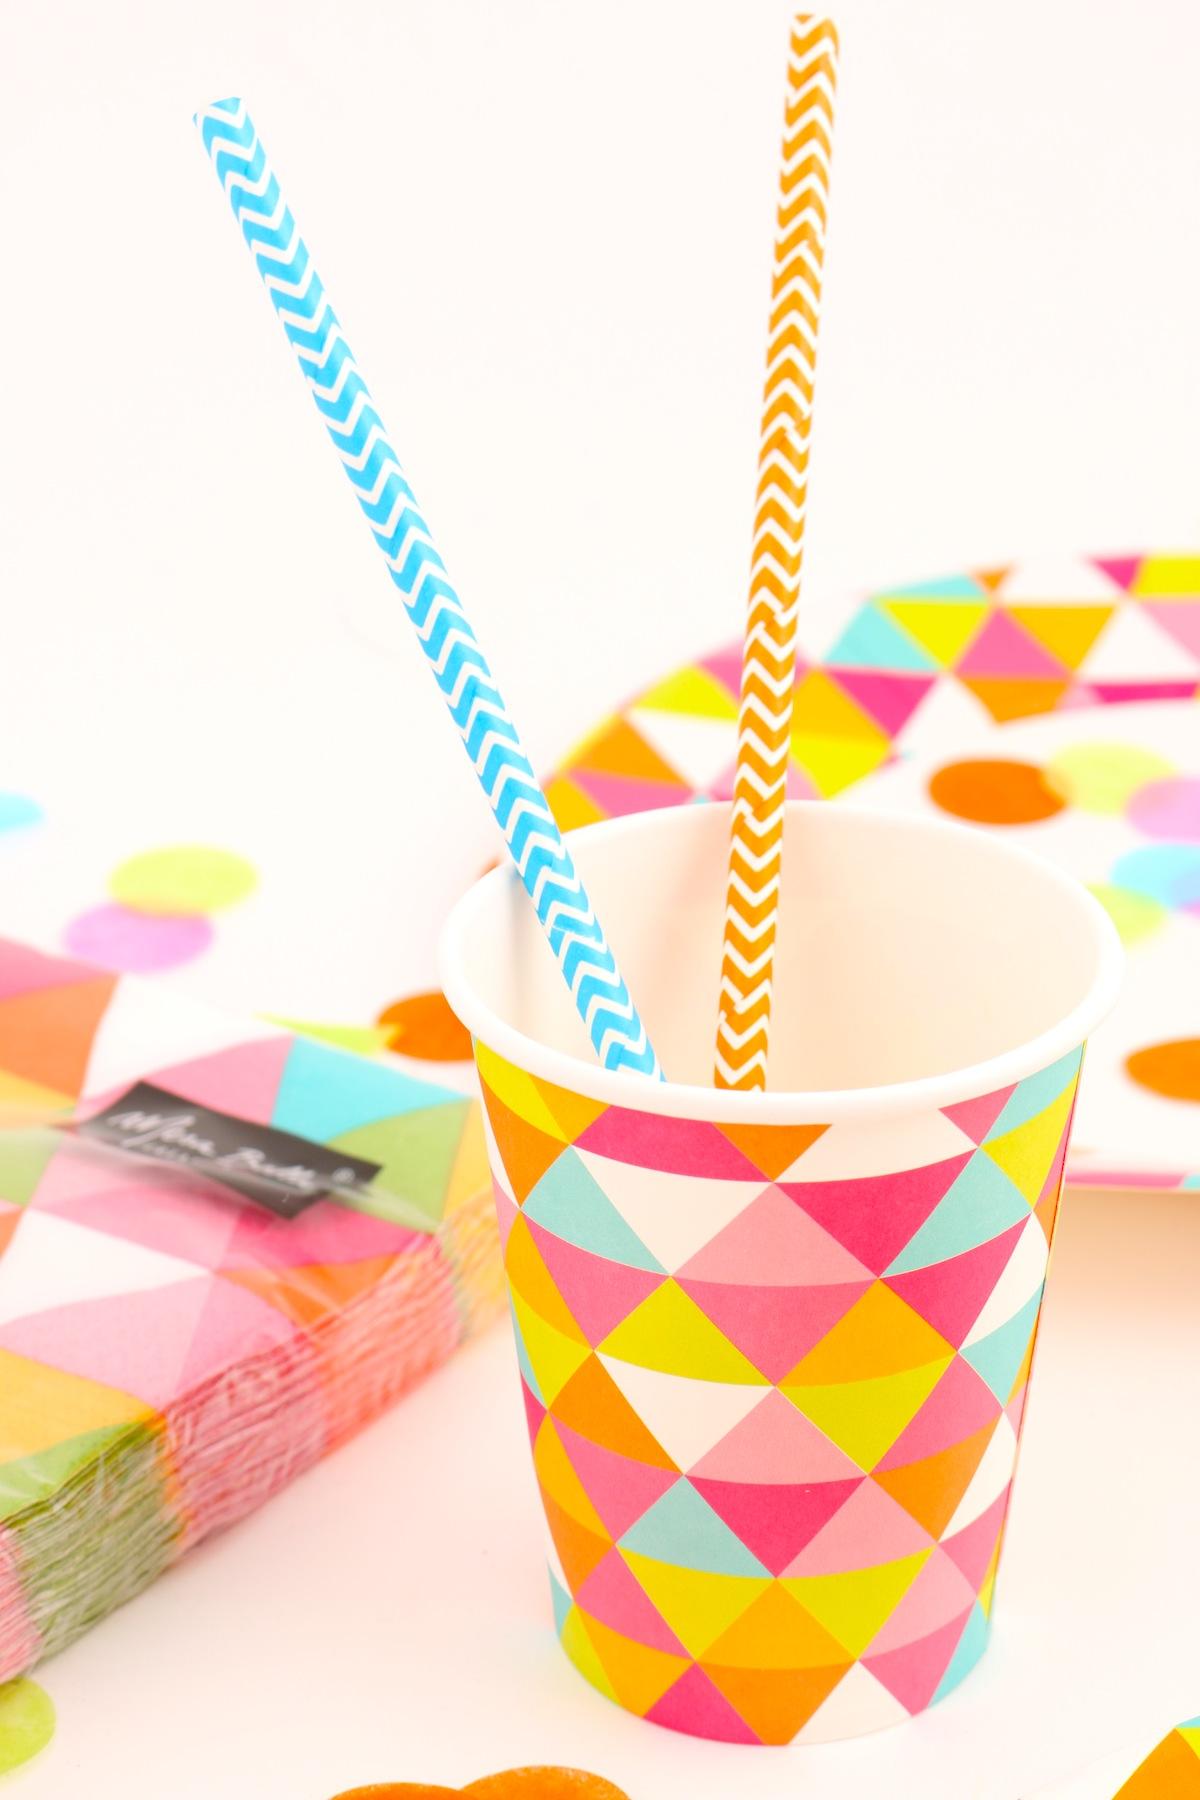 Paille et gobelets en carton collection Tangram Mesa bella pour le carnaval